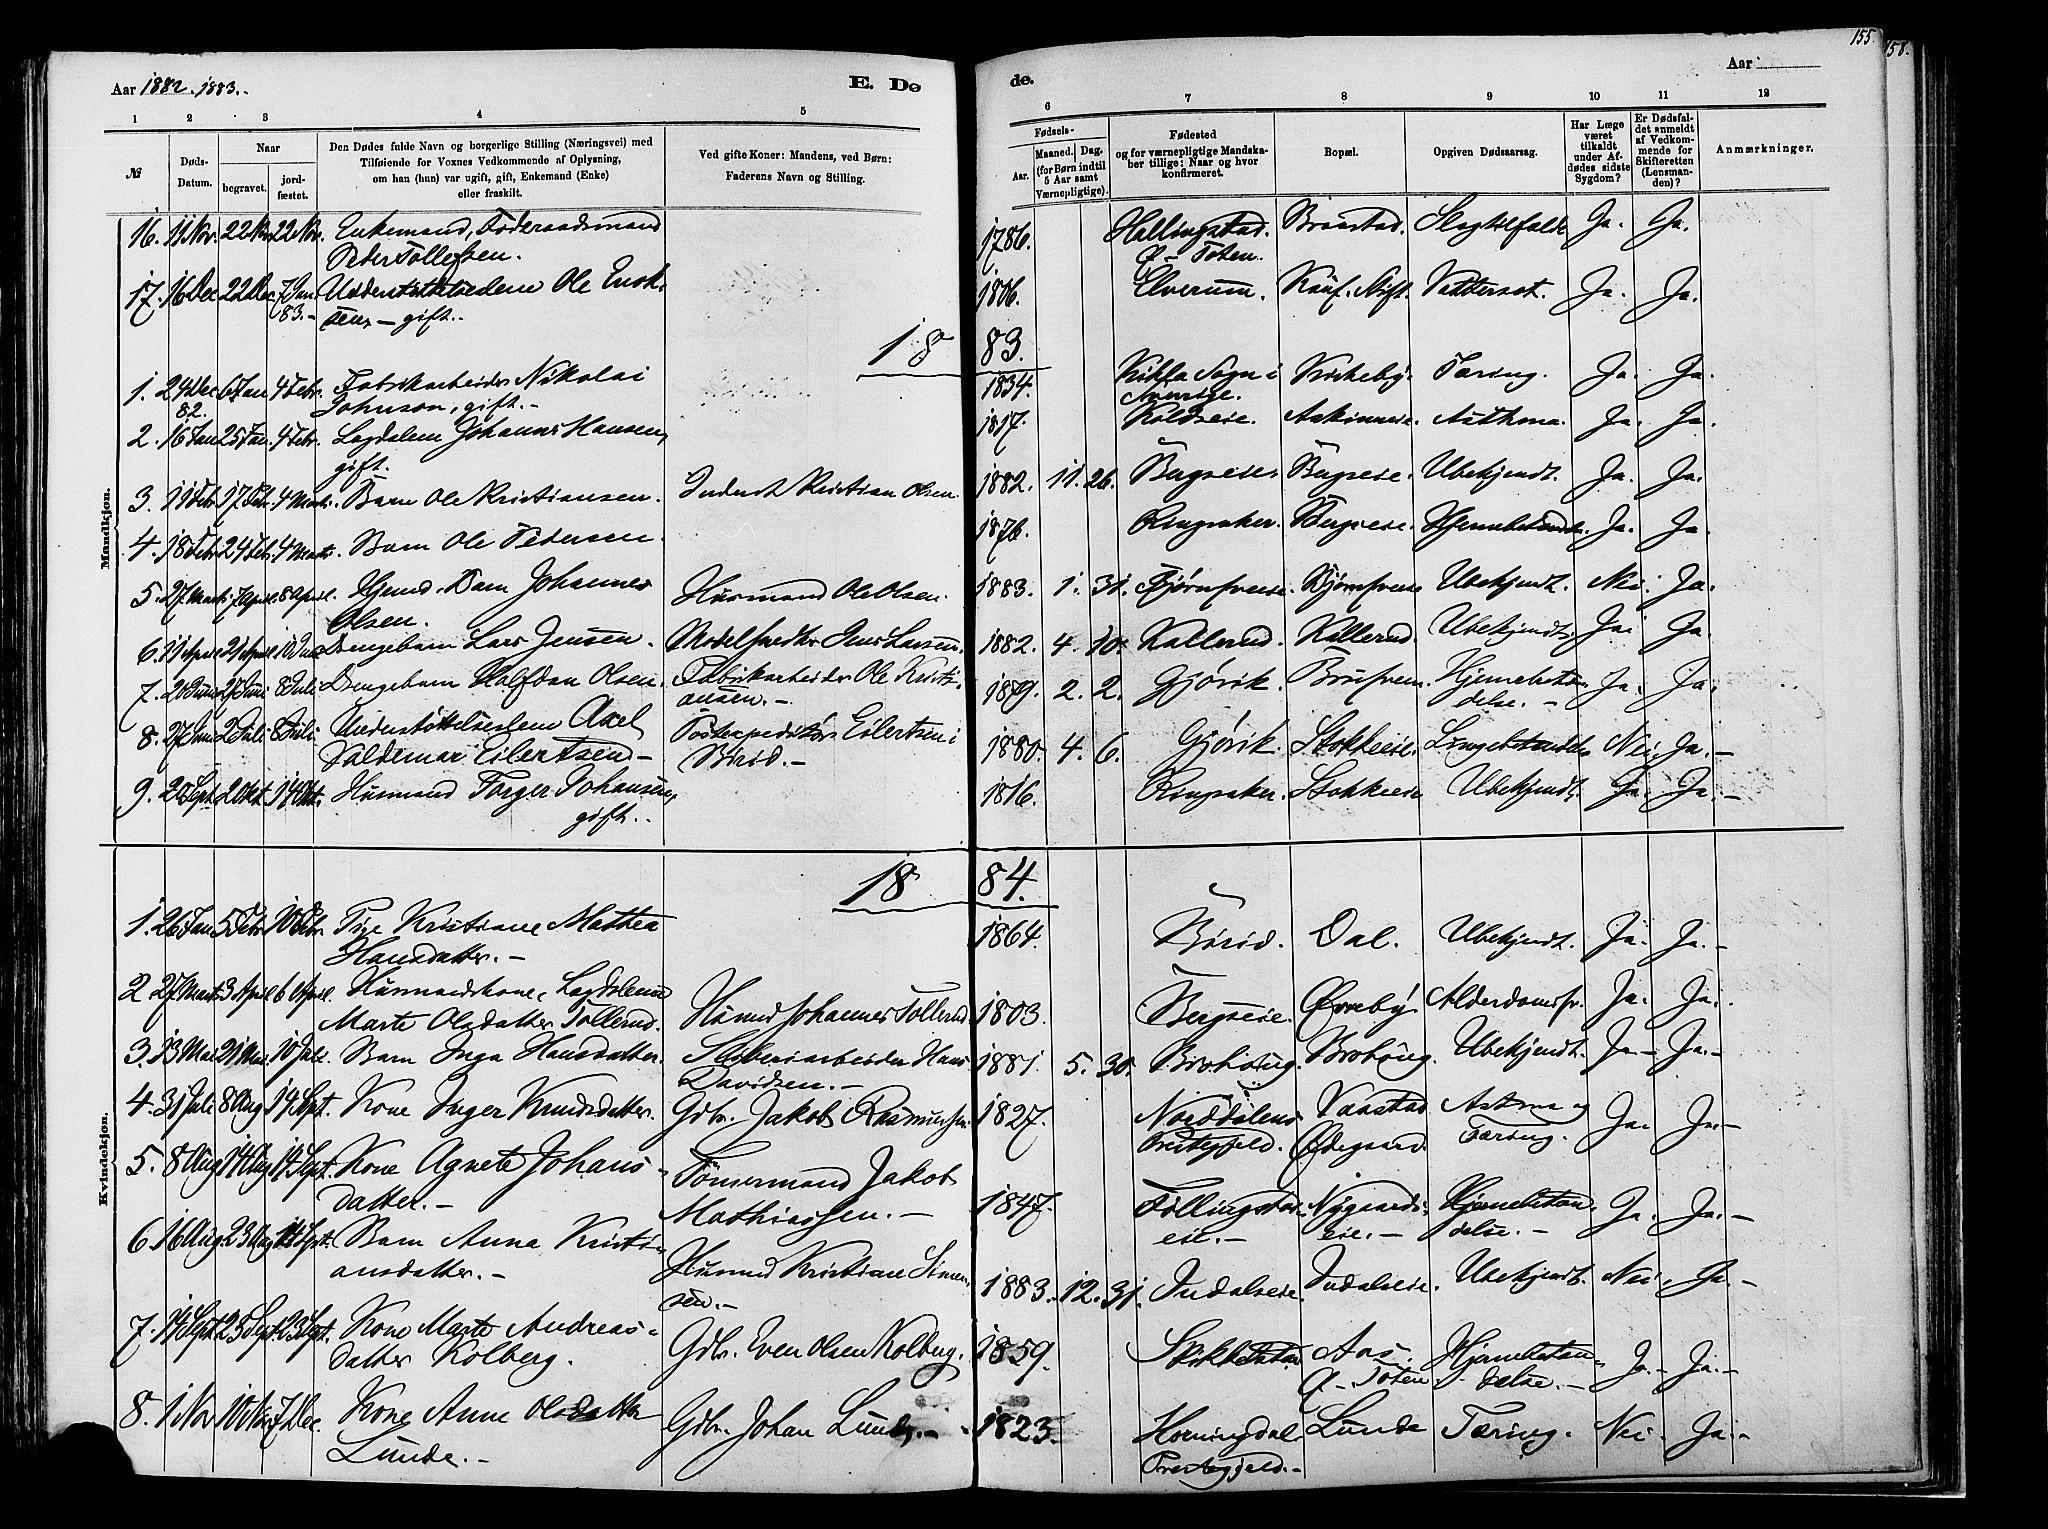 SAH, Vardal prestekontor, H/Ha/Haa/L0009: Ministerialbok nr. 9, 1878-1892, s. 155